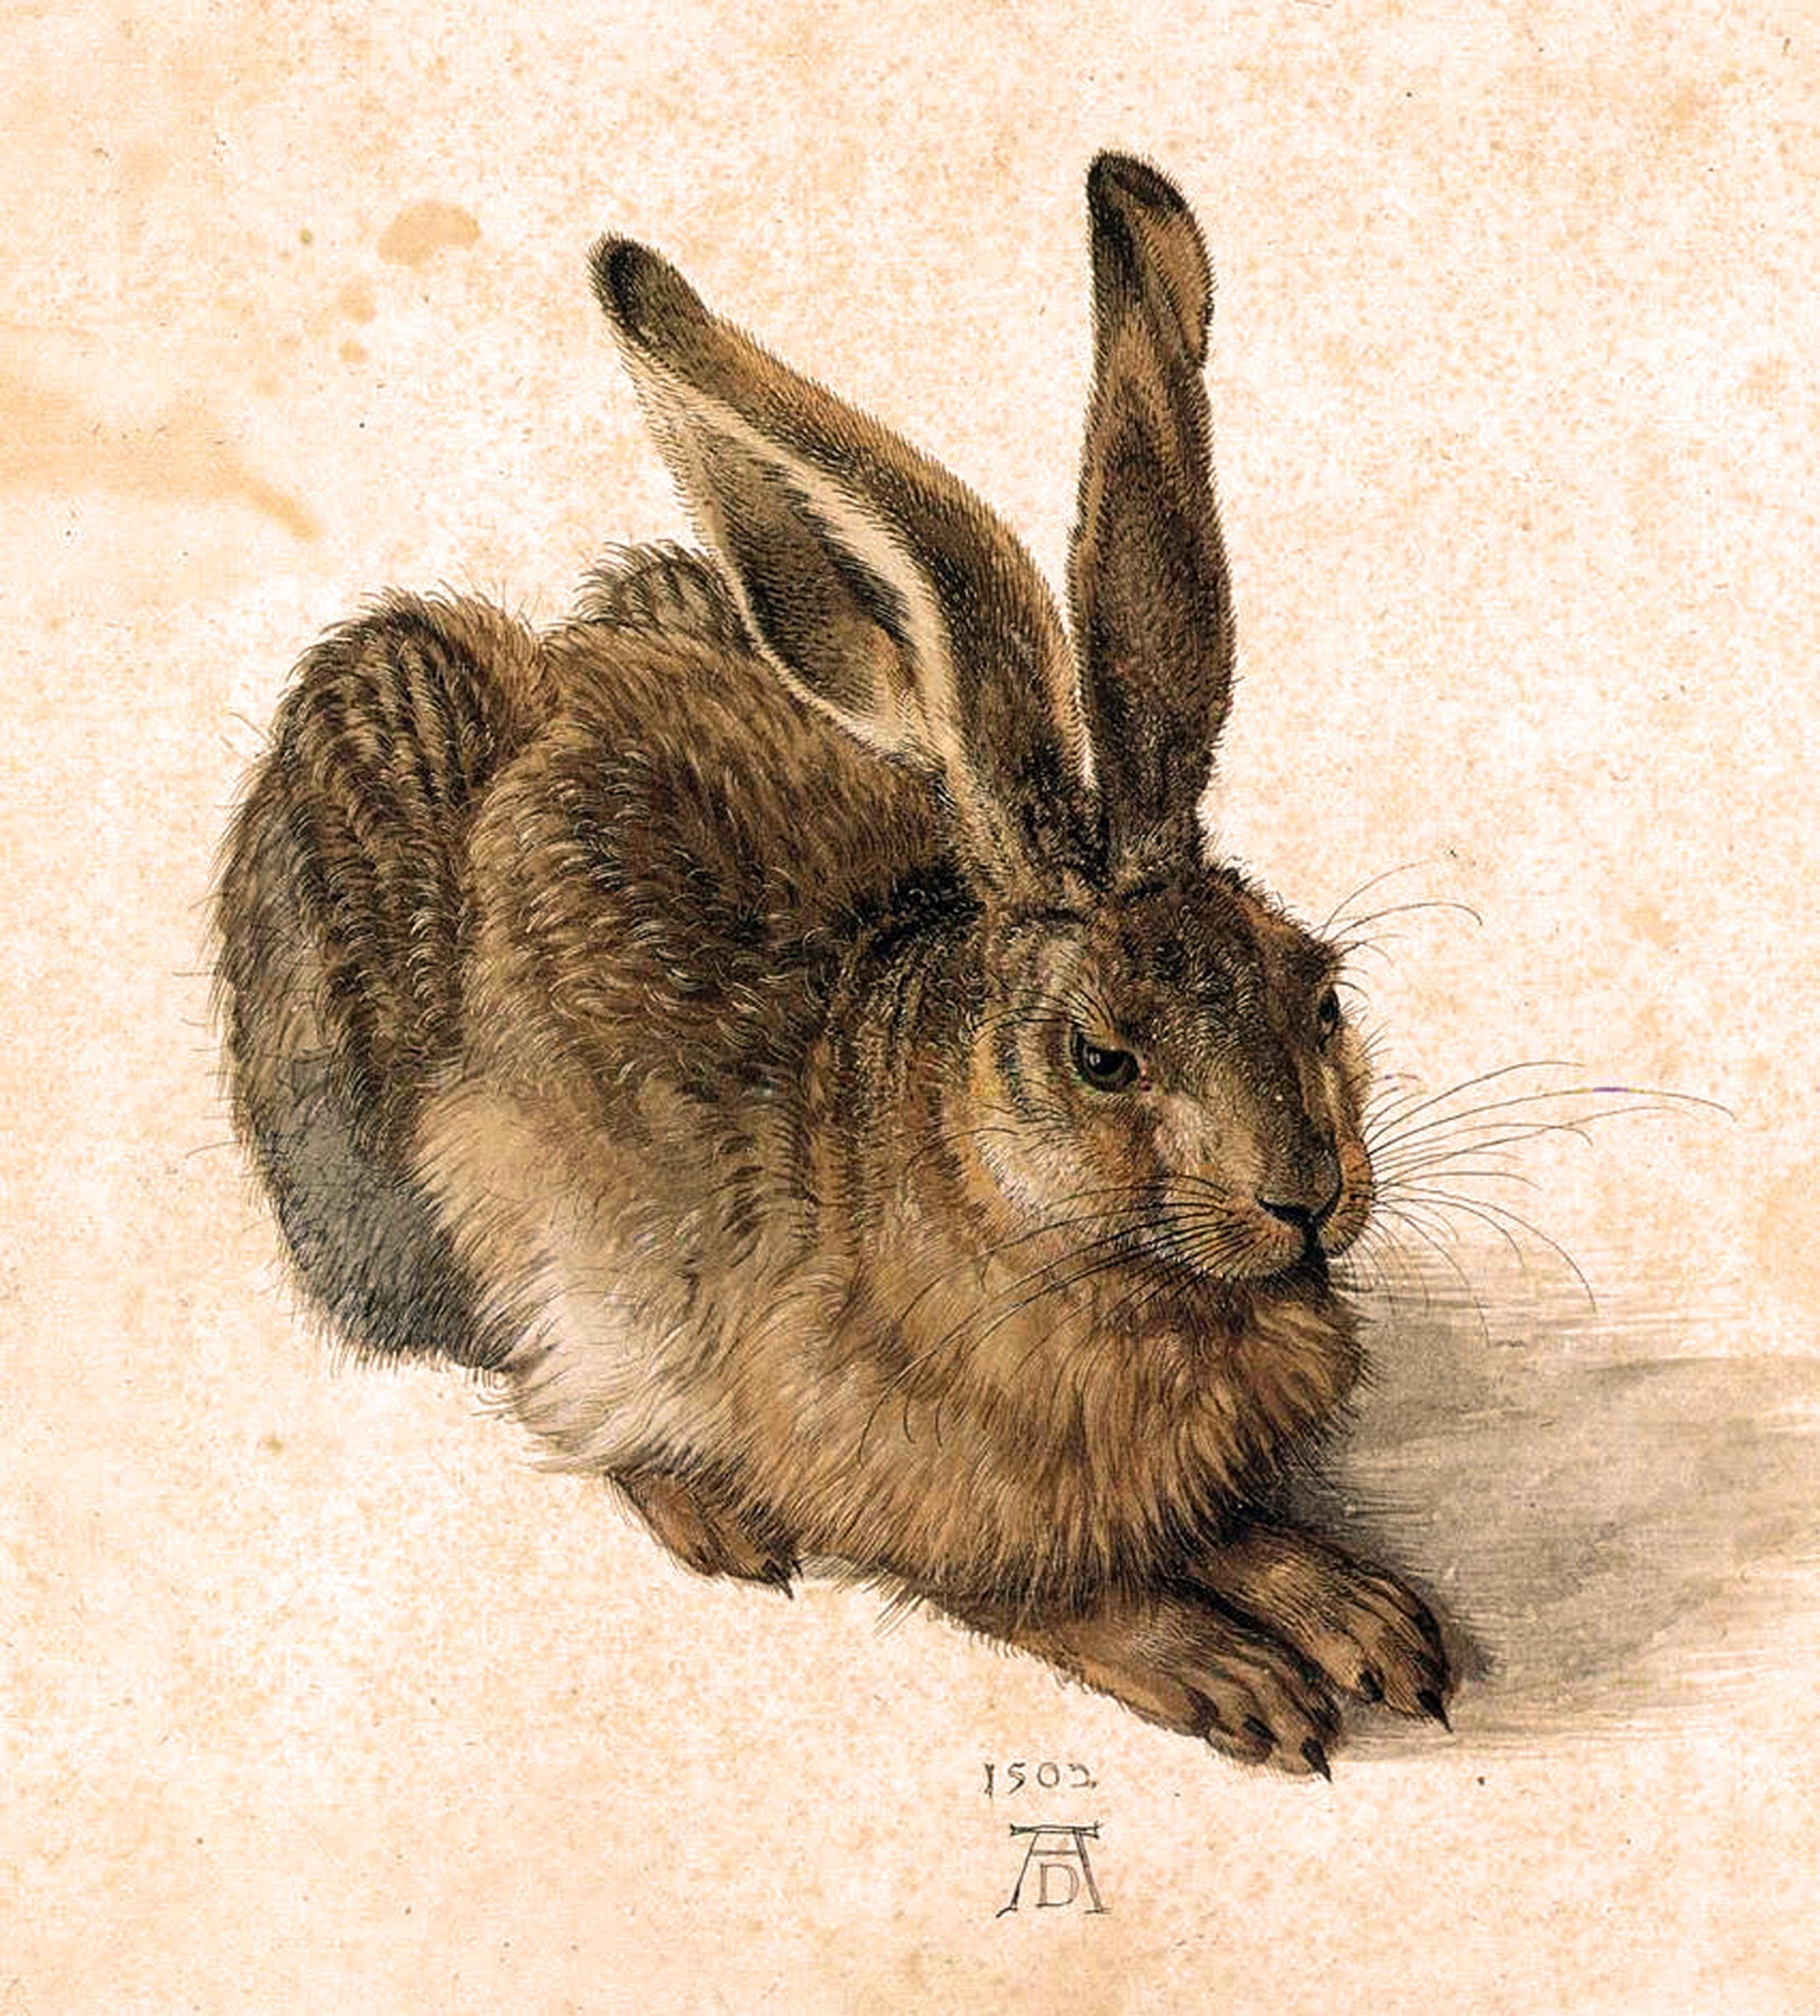 Durer, Albrecht A Young Hare 1502 Watercolor and gouache on paper 25 x 23 cm Graphische Sammlung Albertina, Vienna